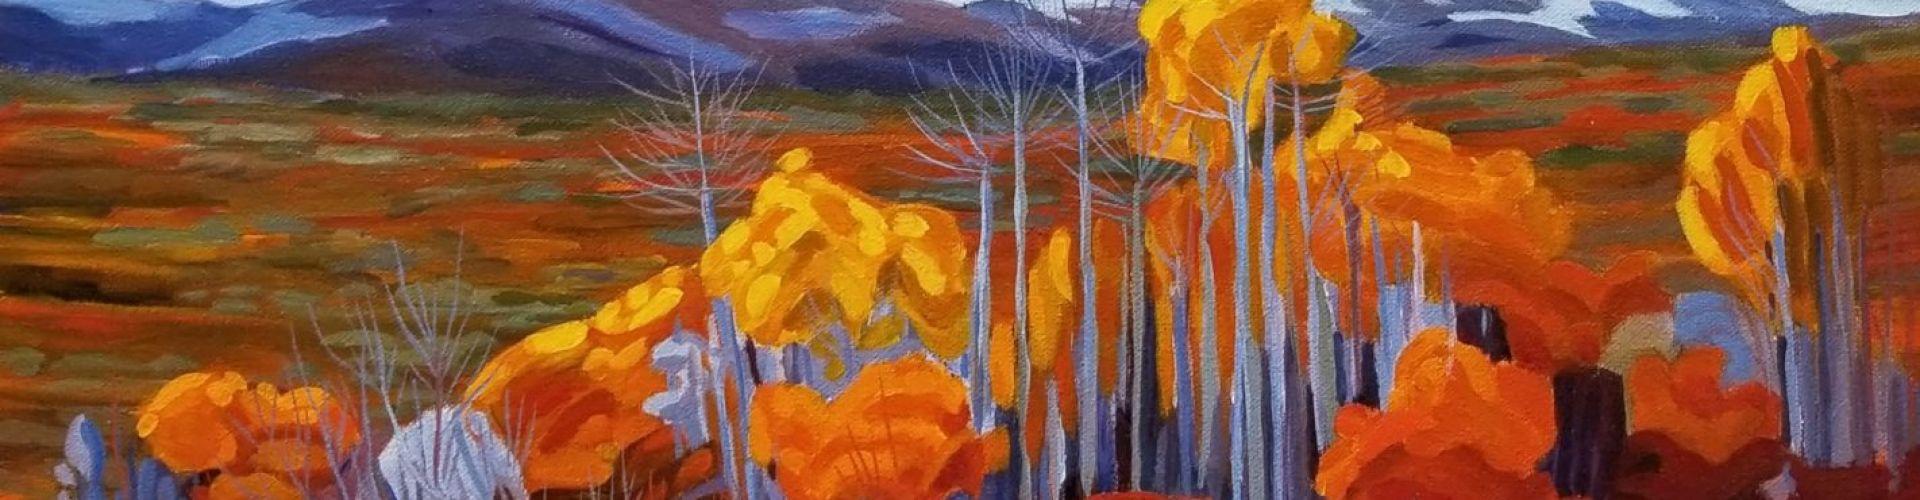 Poplar Stand painting by Linda Lovisa